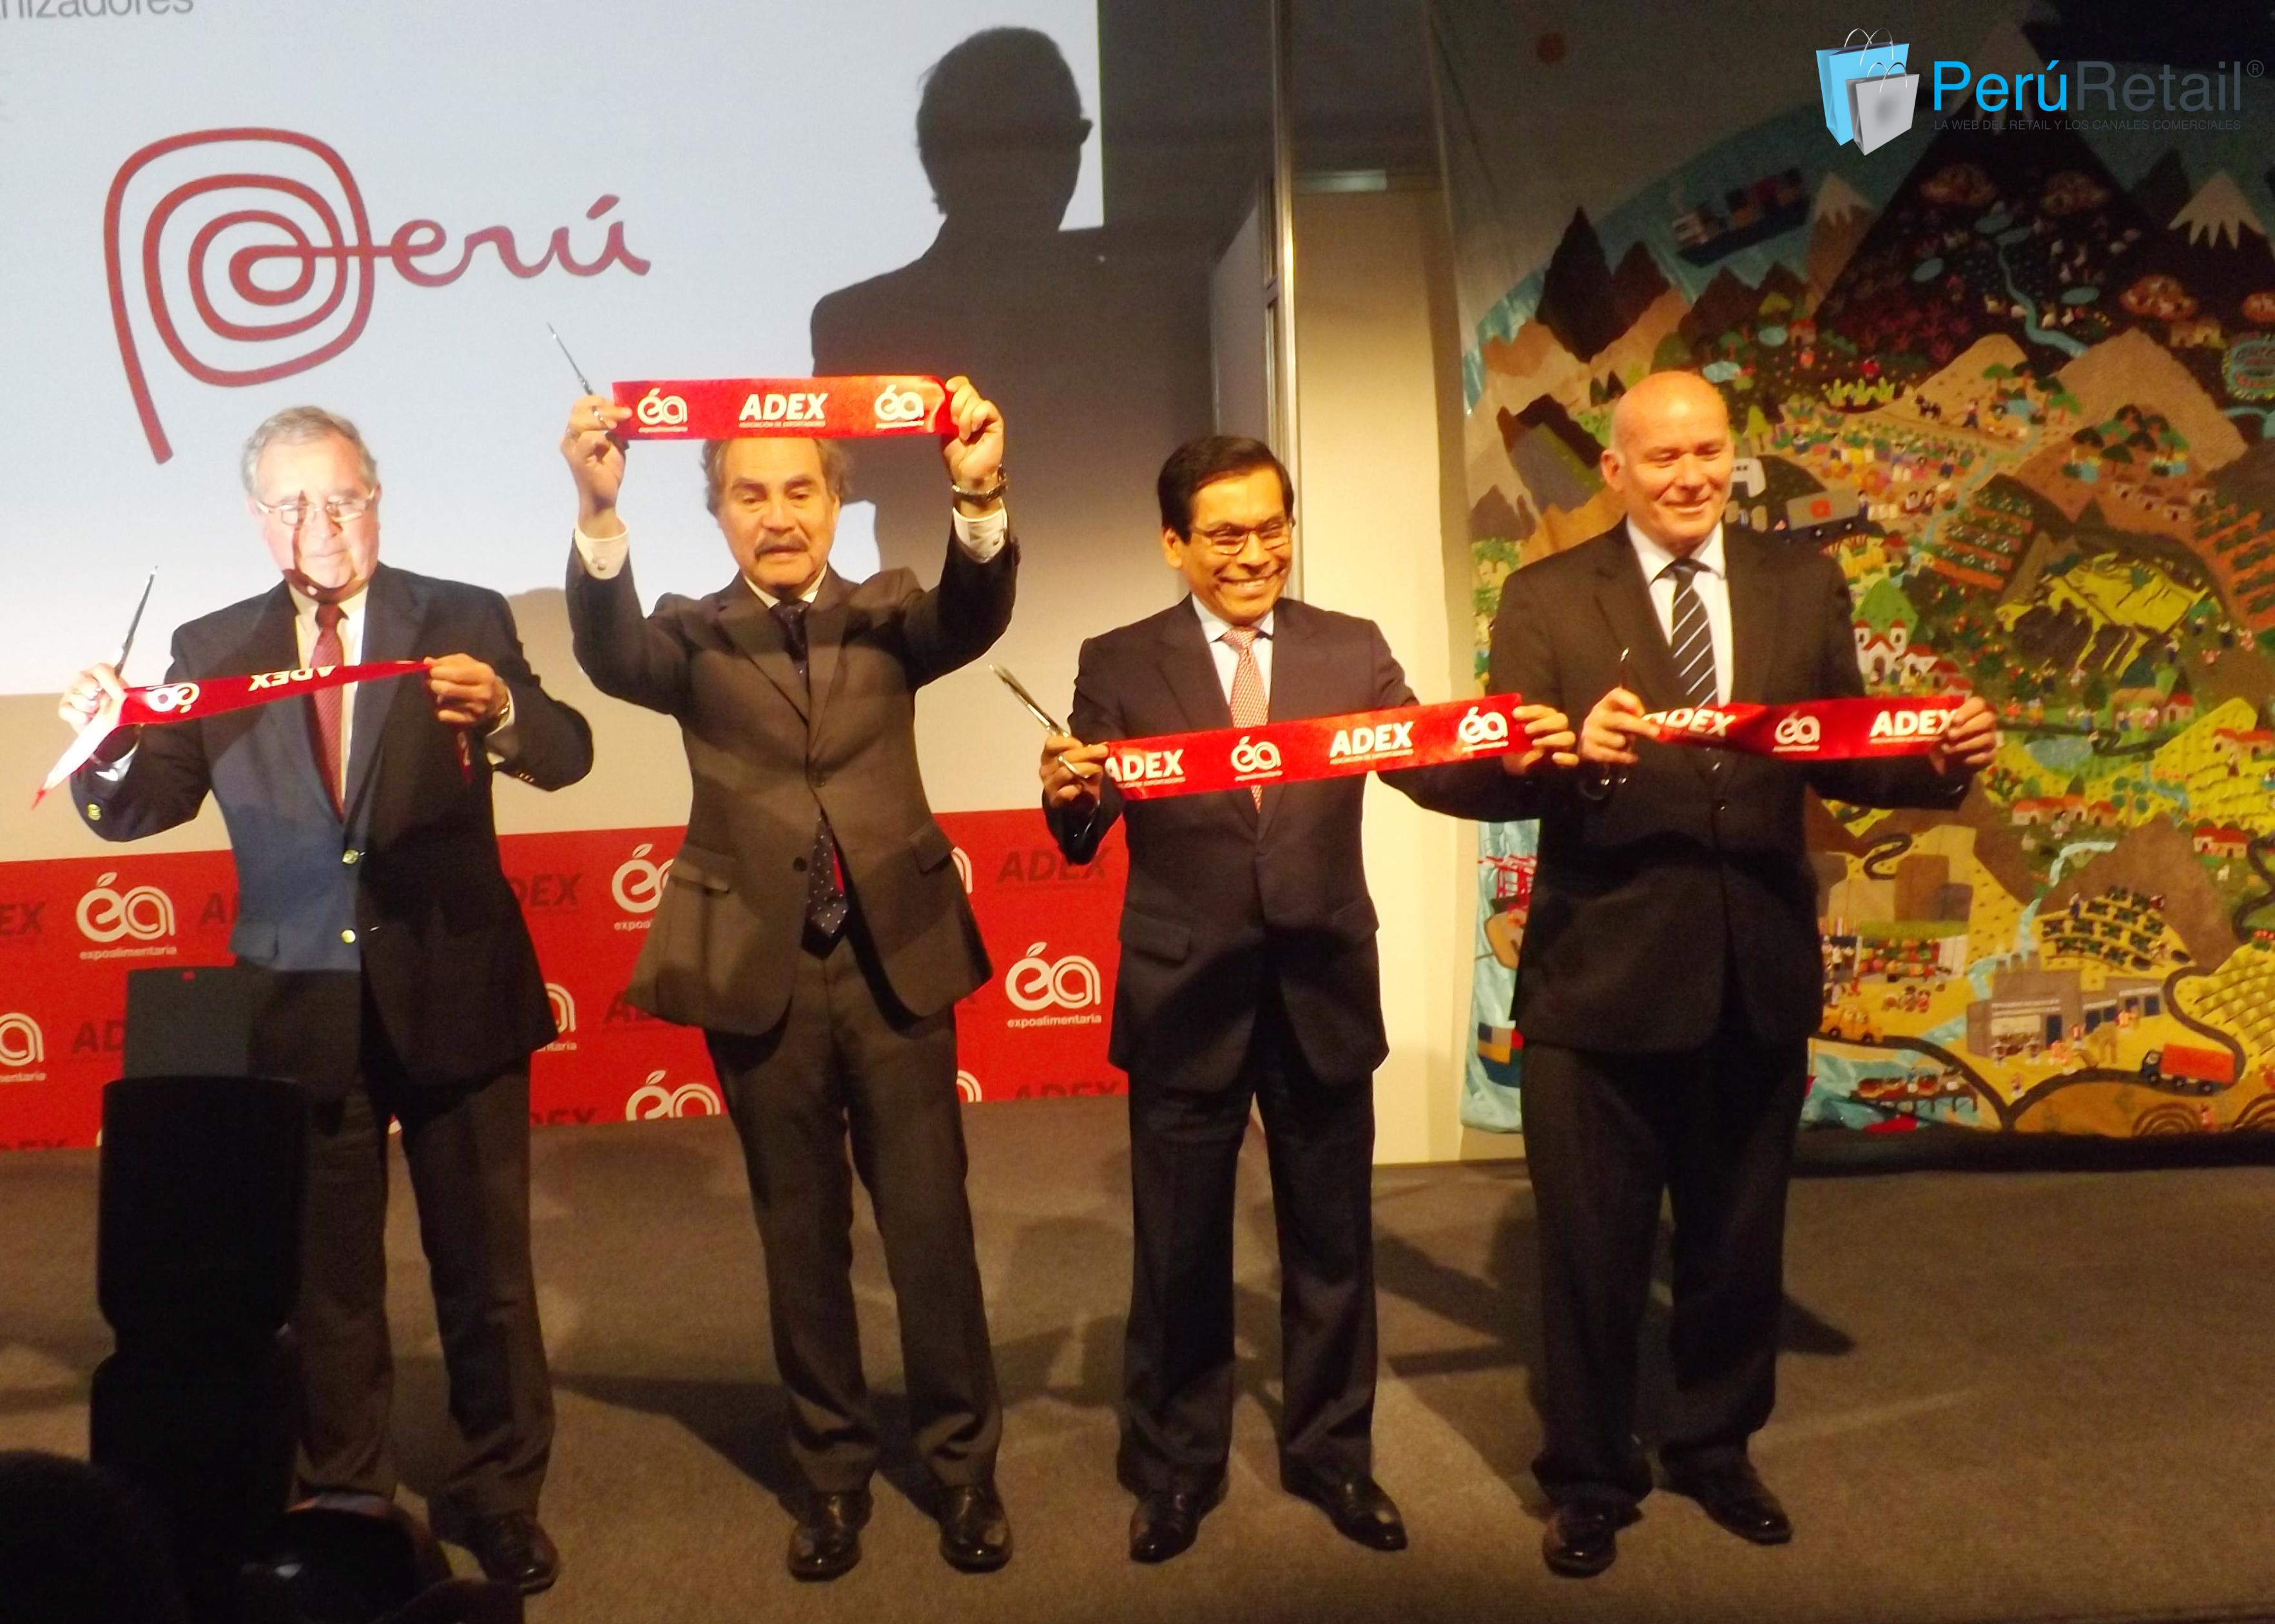 expoalimentaria 2017 1 Peru Retail - Expoalimentaria 2017: Comenzó la feria de alimentos más grande de América Latina